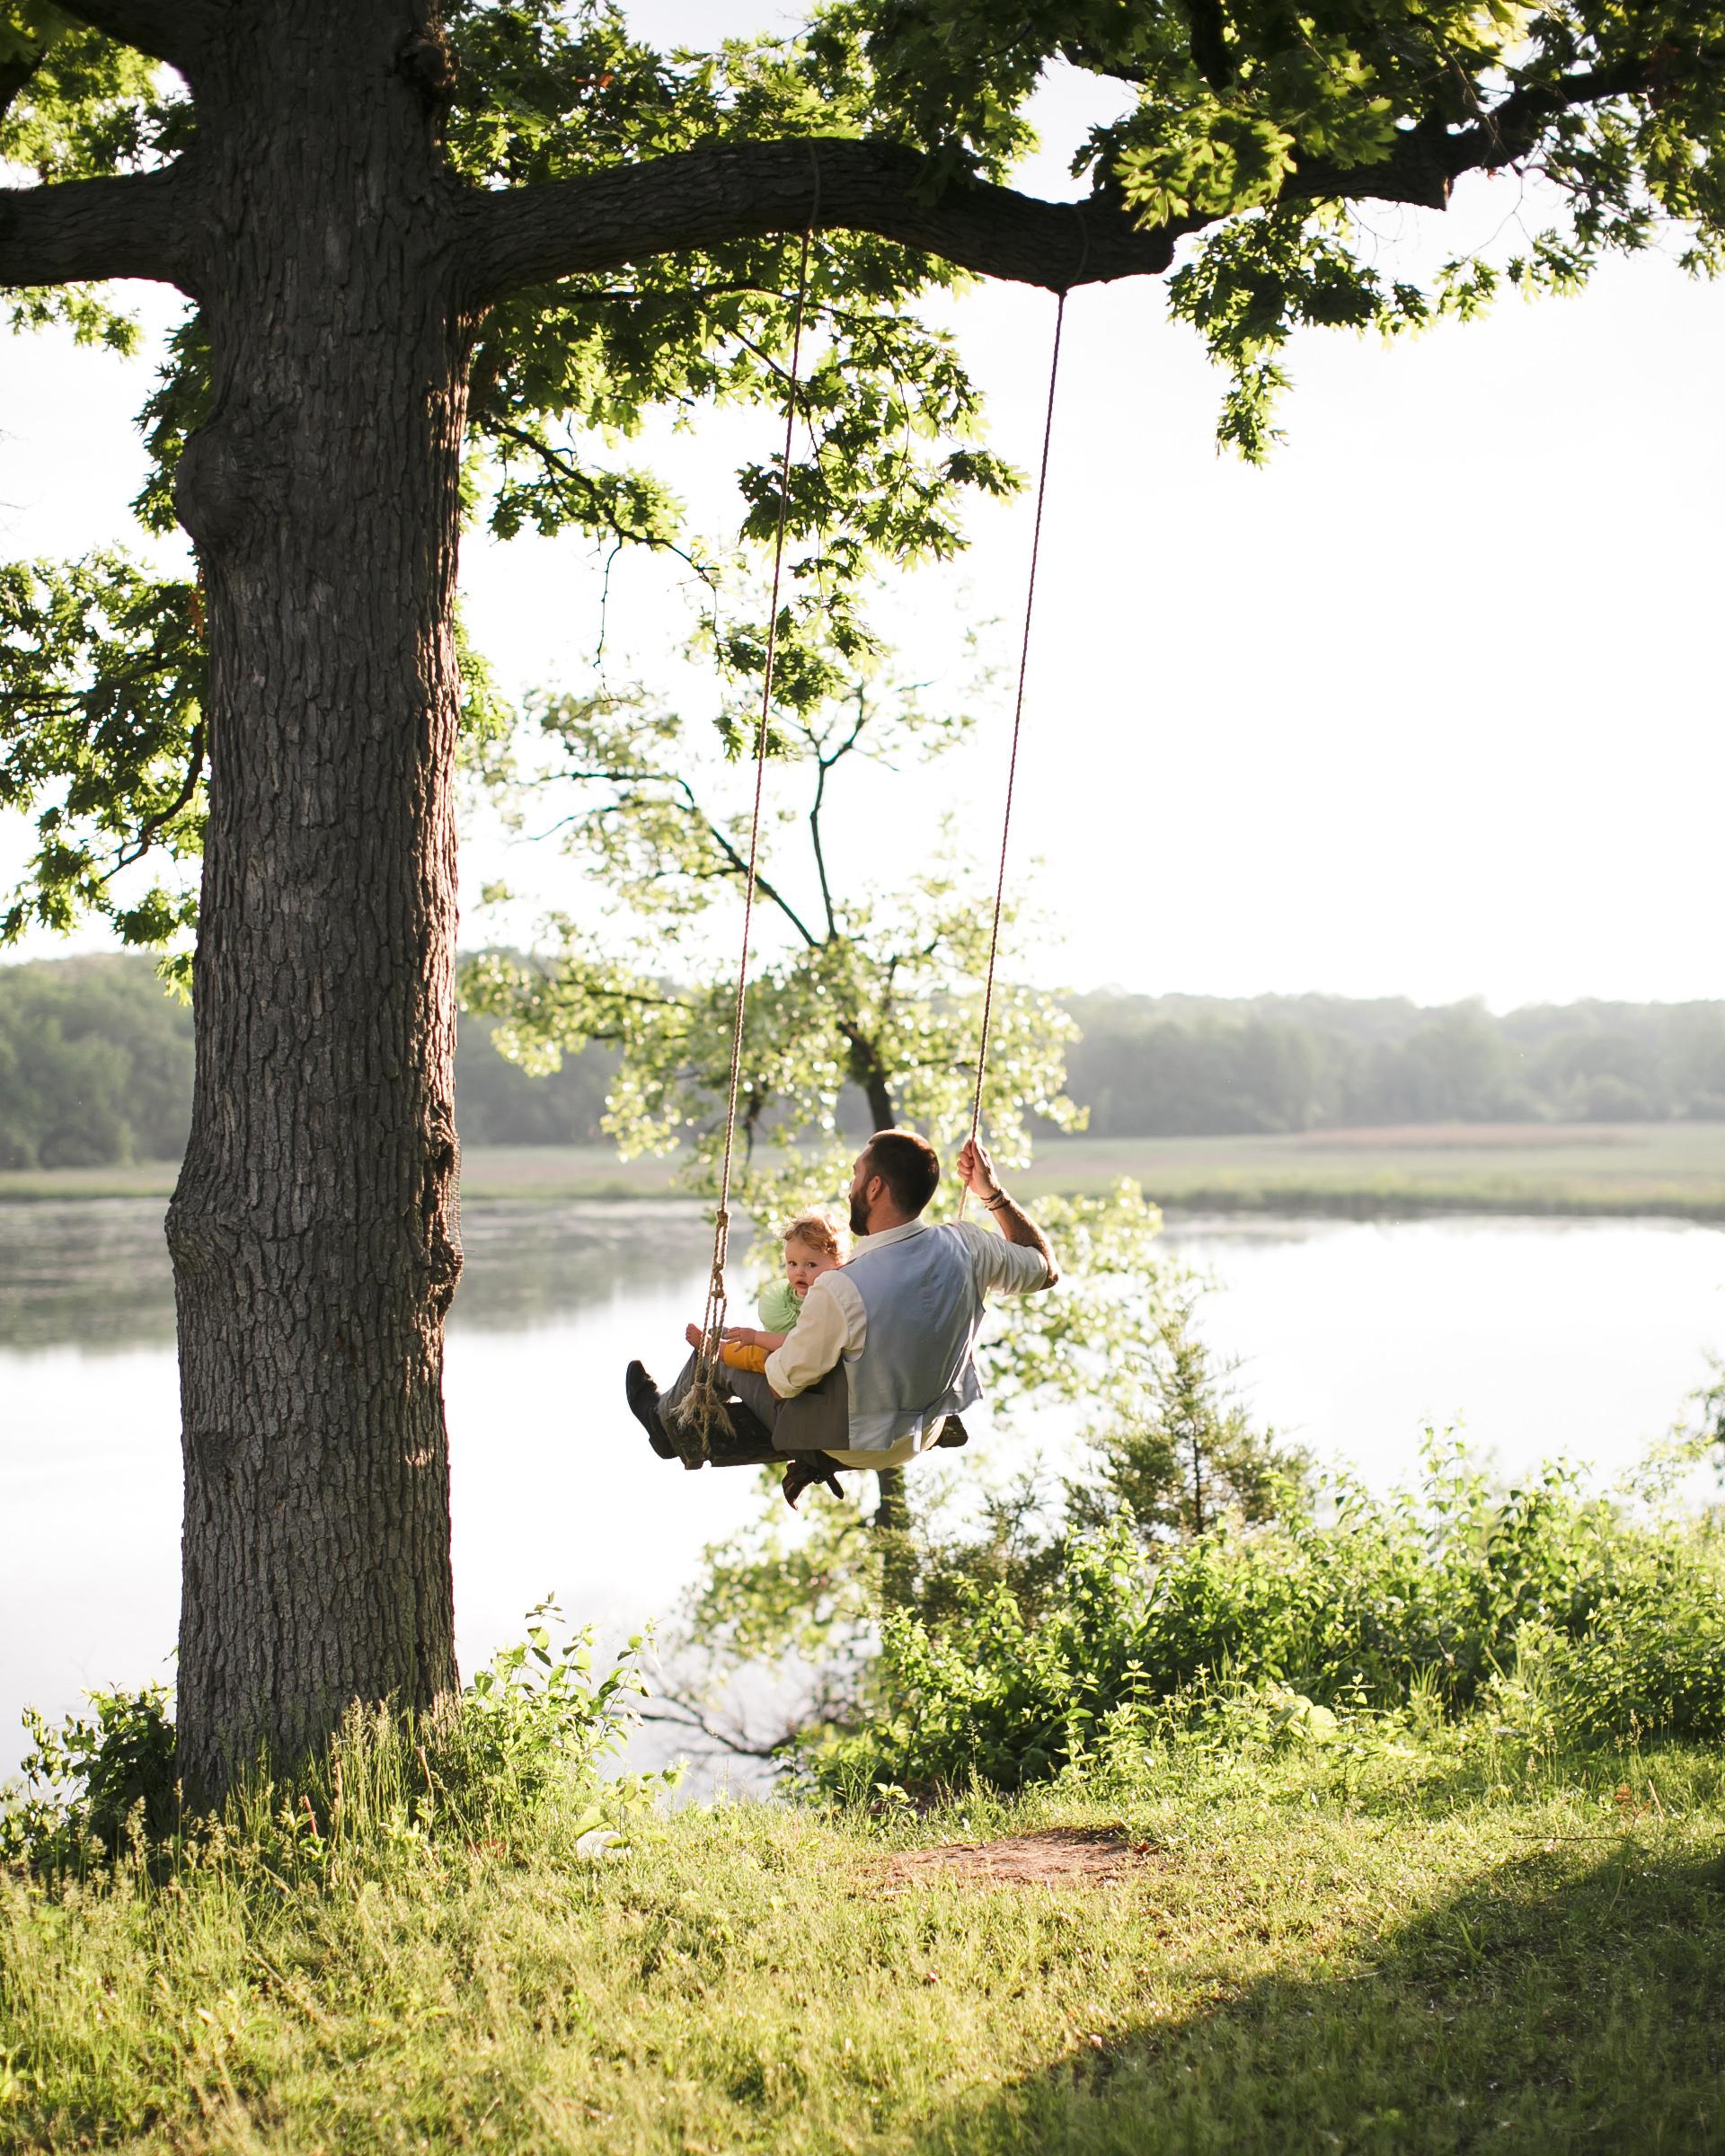 kelly-marie-dave-wedding-swing-0414.jpg